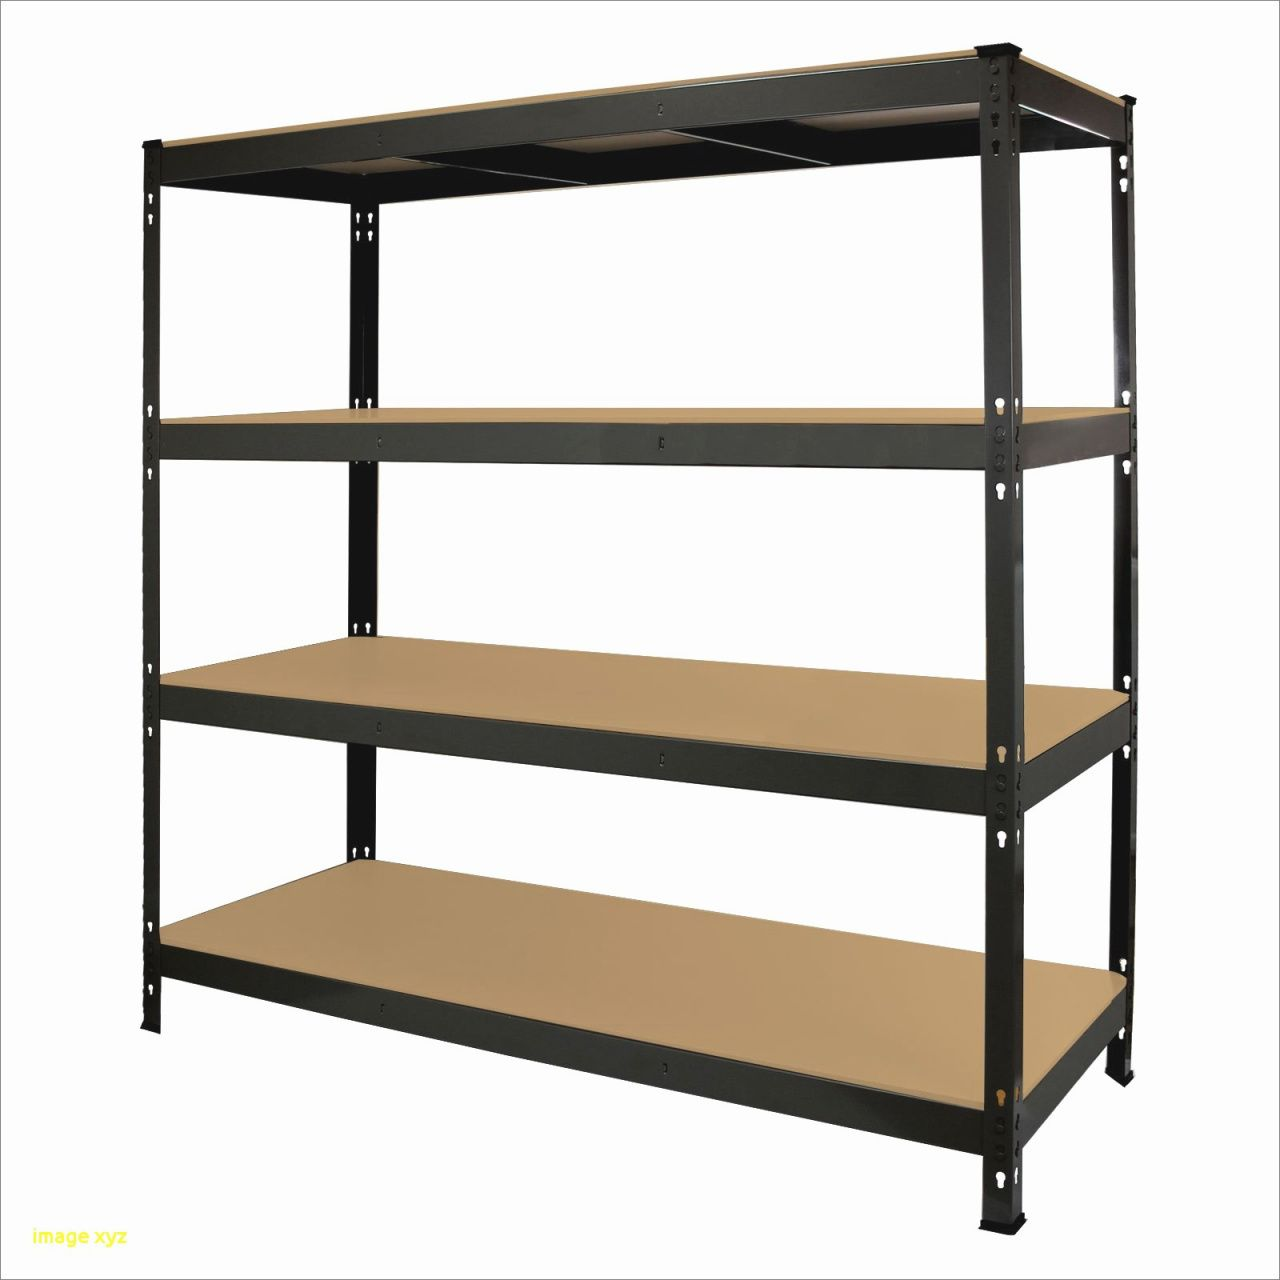 201 Etagere Murale Brico Depot Diy Garage Storage Cabinets Metal Bookcase Wall Storage Shelves